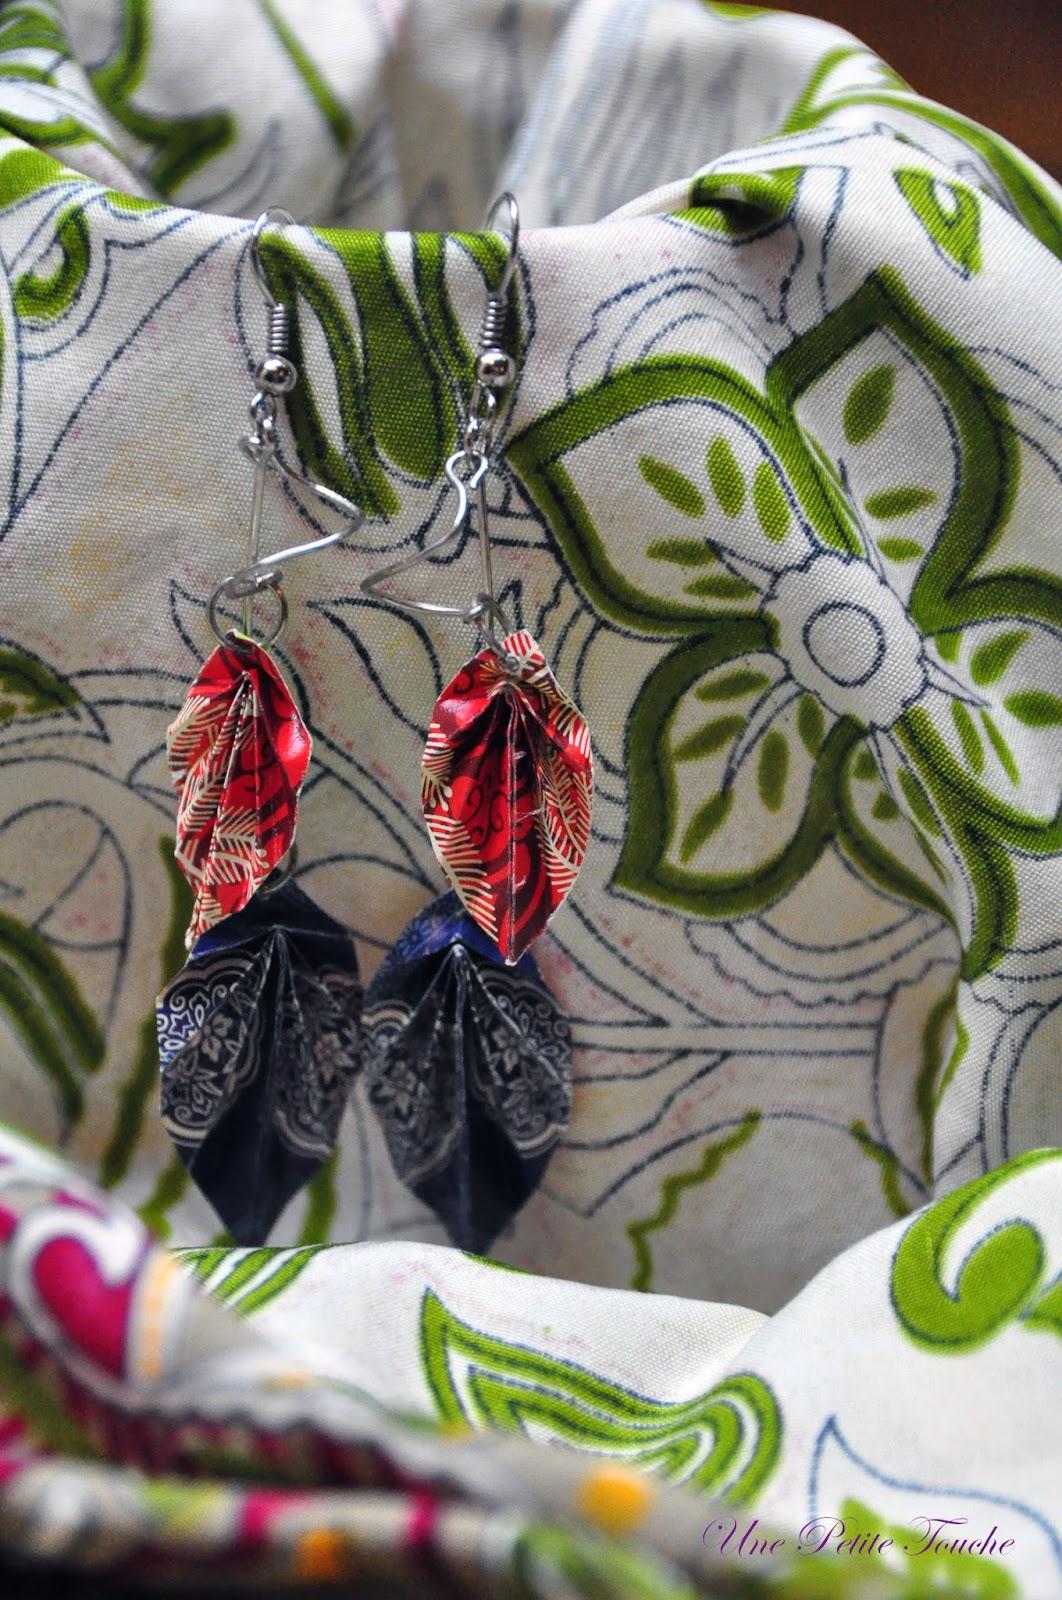 Листья-оригами вдохновили на новую пару сережек. Моя коллекция сережек оригами пополняется! Les feuilles en origami m'ont inspirés à faire cette paire de boucles d'oreille. Ma collection de boucles d'oreille en origami commence s'agrandir! Origami-leaves inspired me to make this pair of earrings. My collection of origami earrings starts to grow!